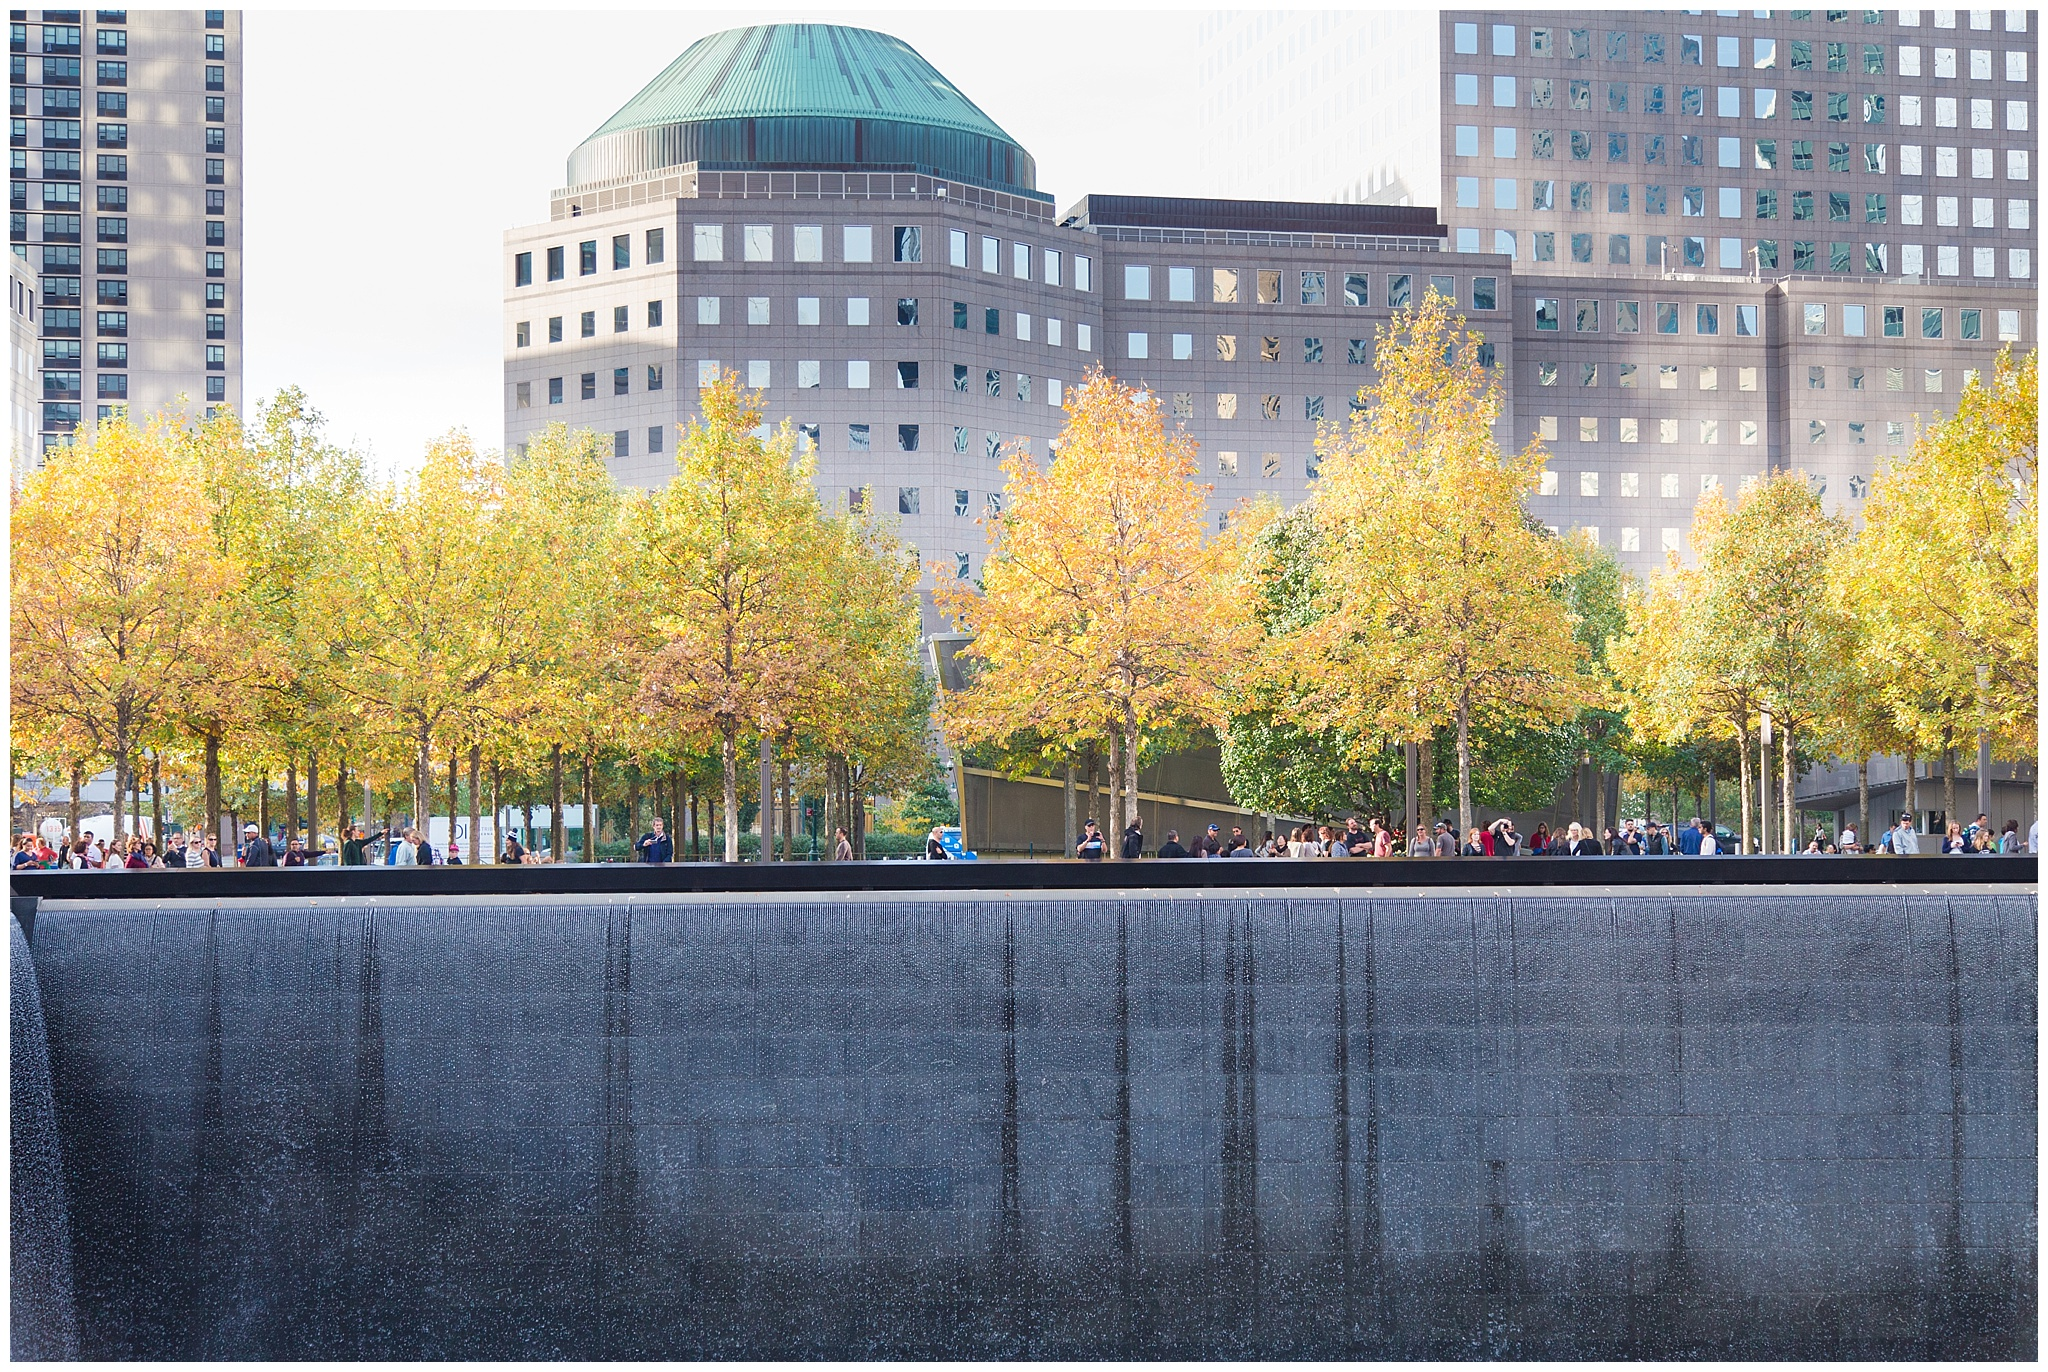 NYC_0015.jpg